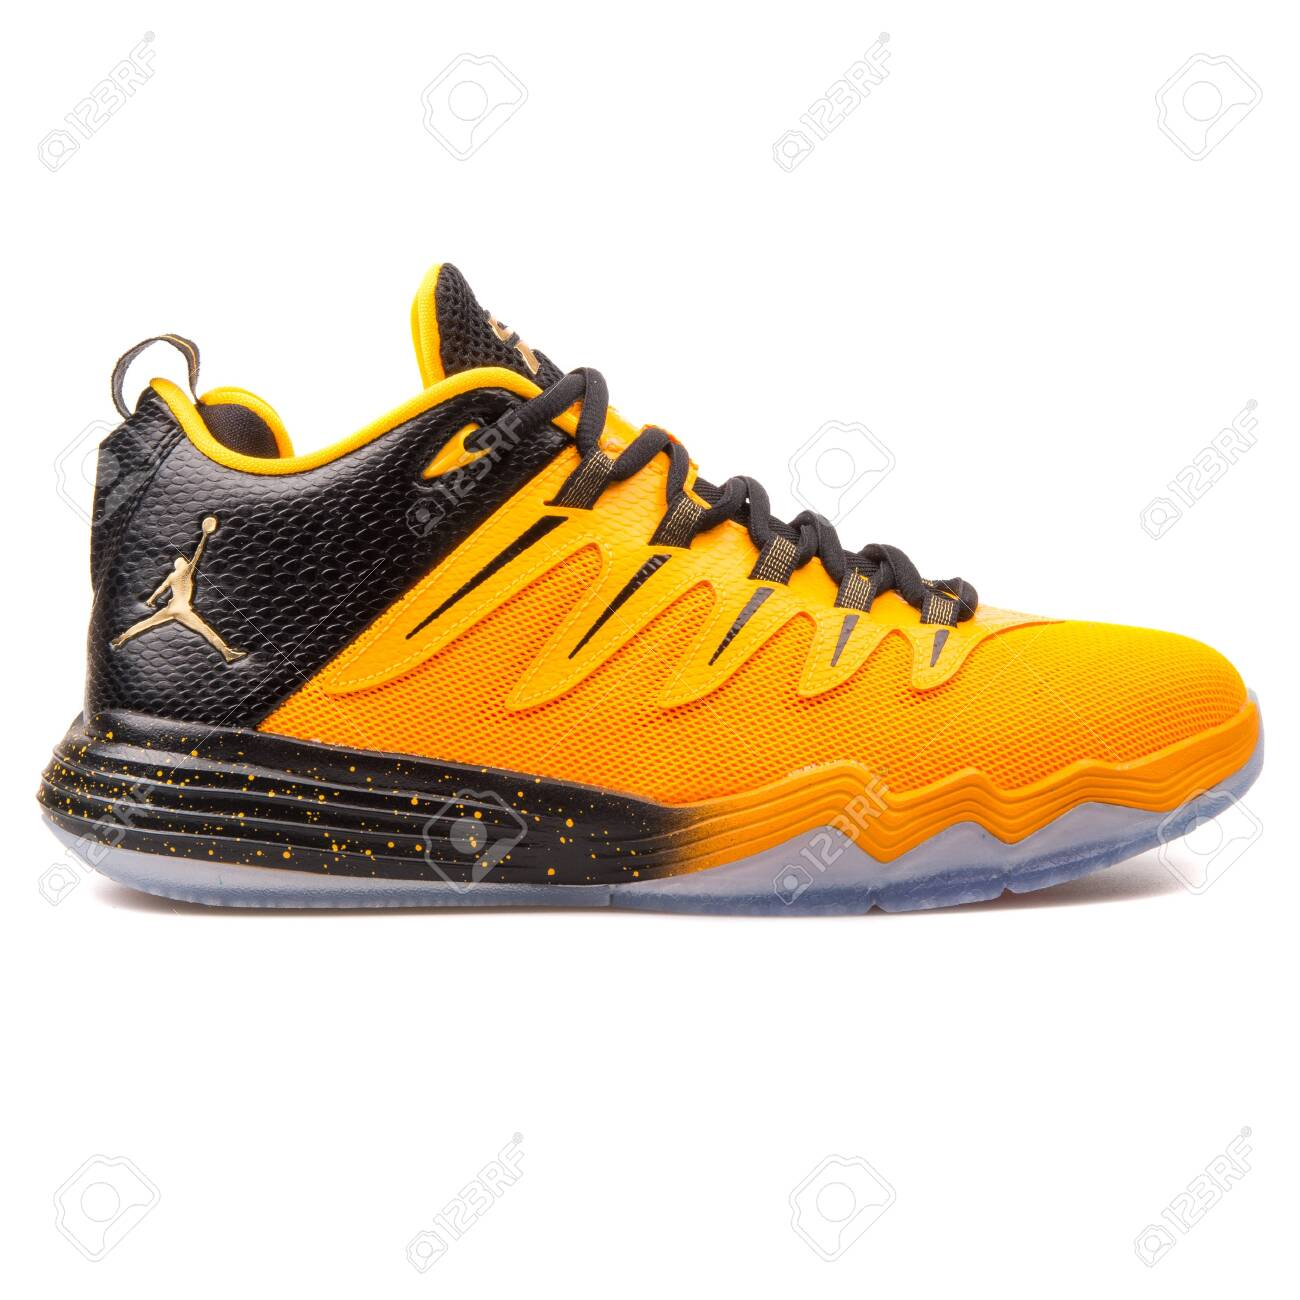 Nike Jordan CP3 IX Orange Sneaker